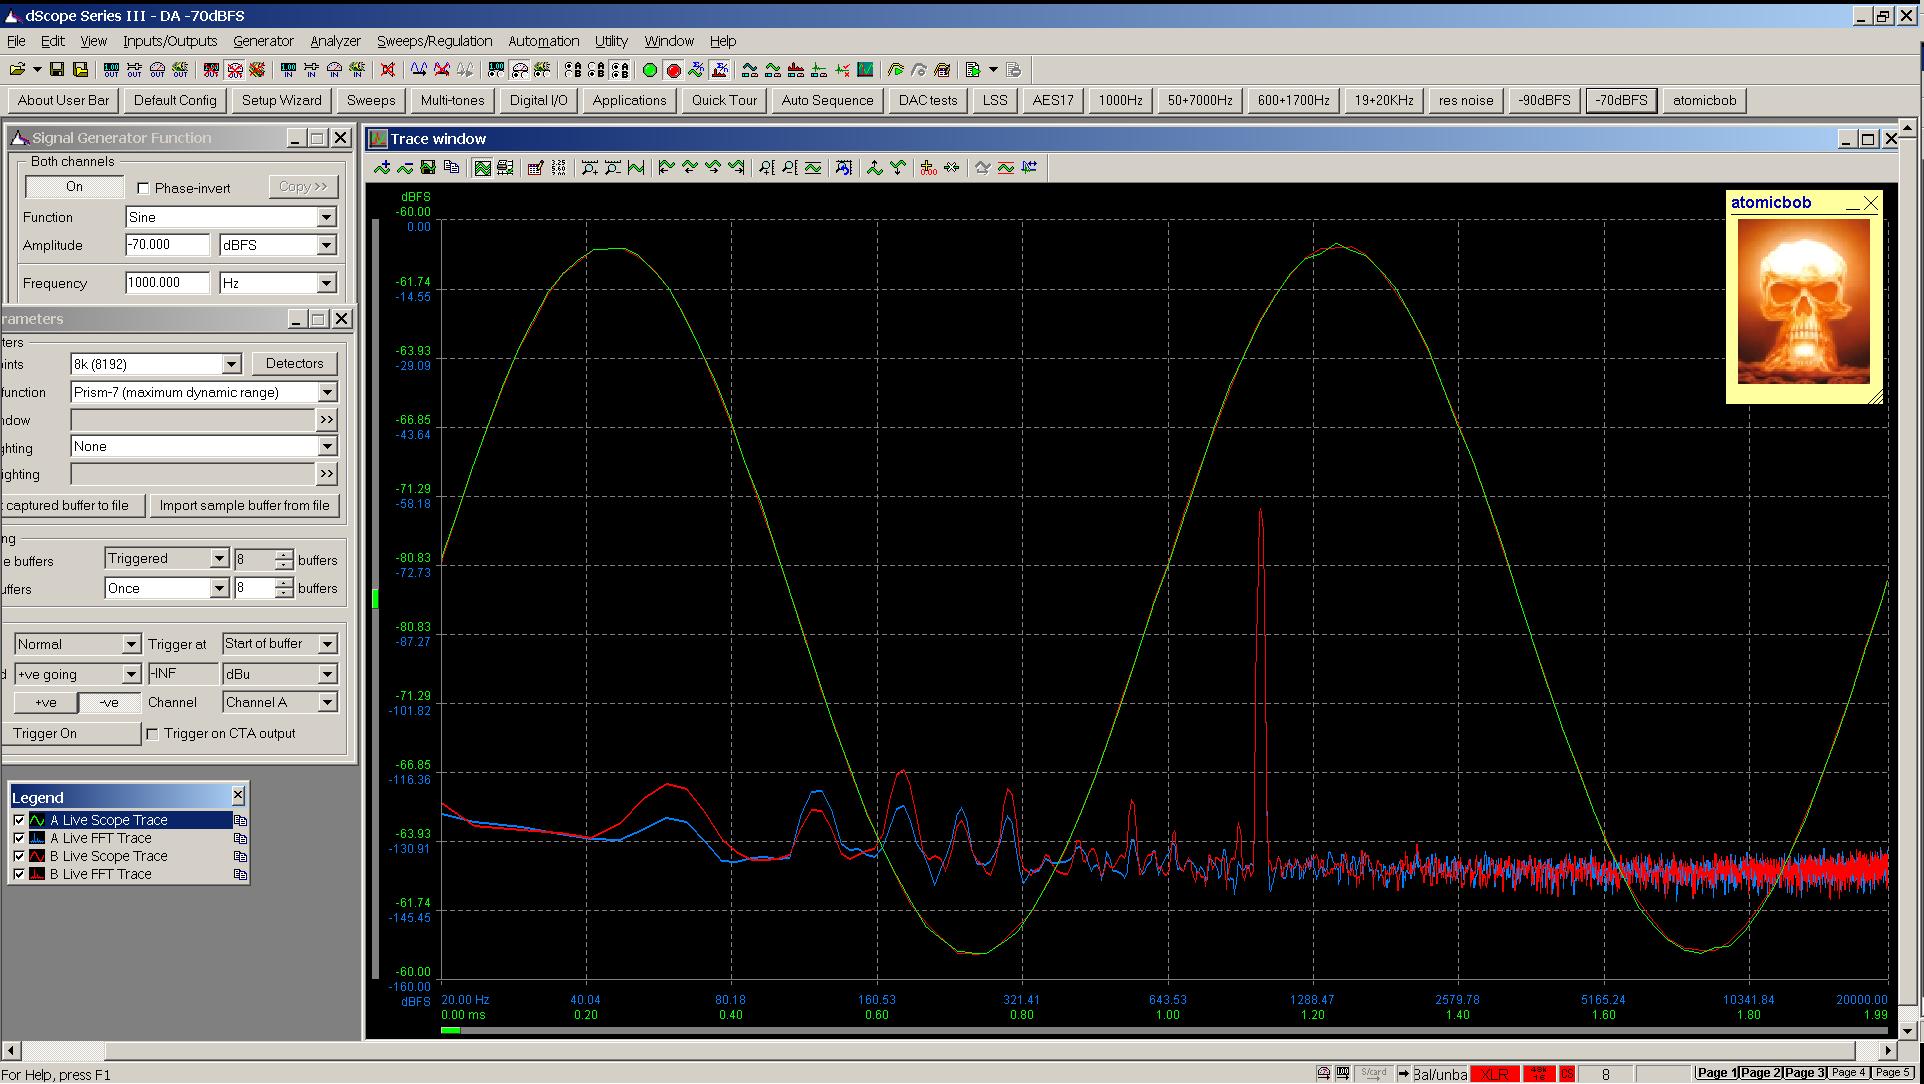 20190323-19 solaris Bal 1 KHz -70 dBFS - AES.PNG